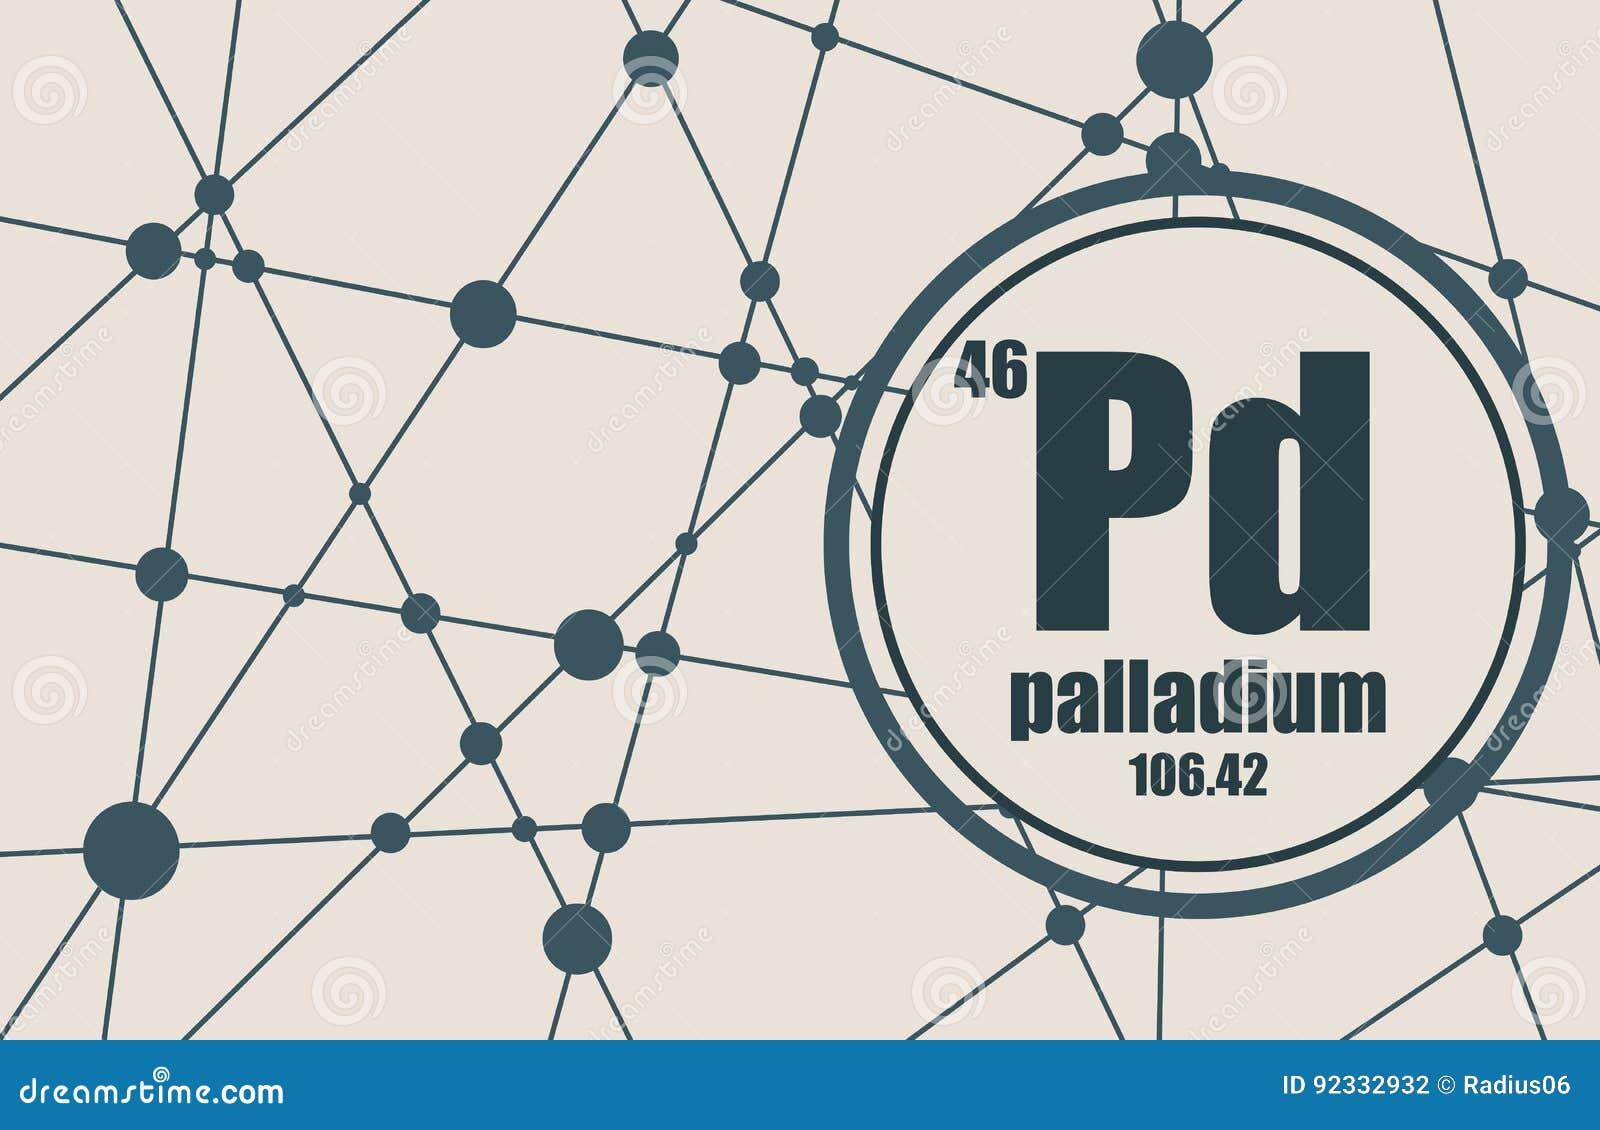 Palladium Chemical Element Stock Vector Illustration Of